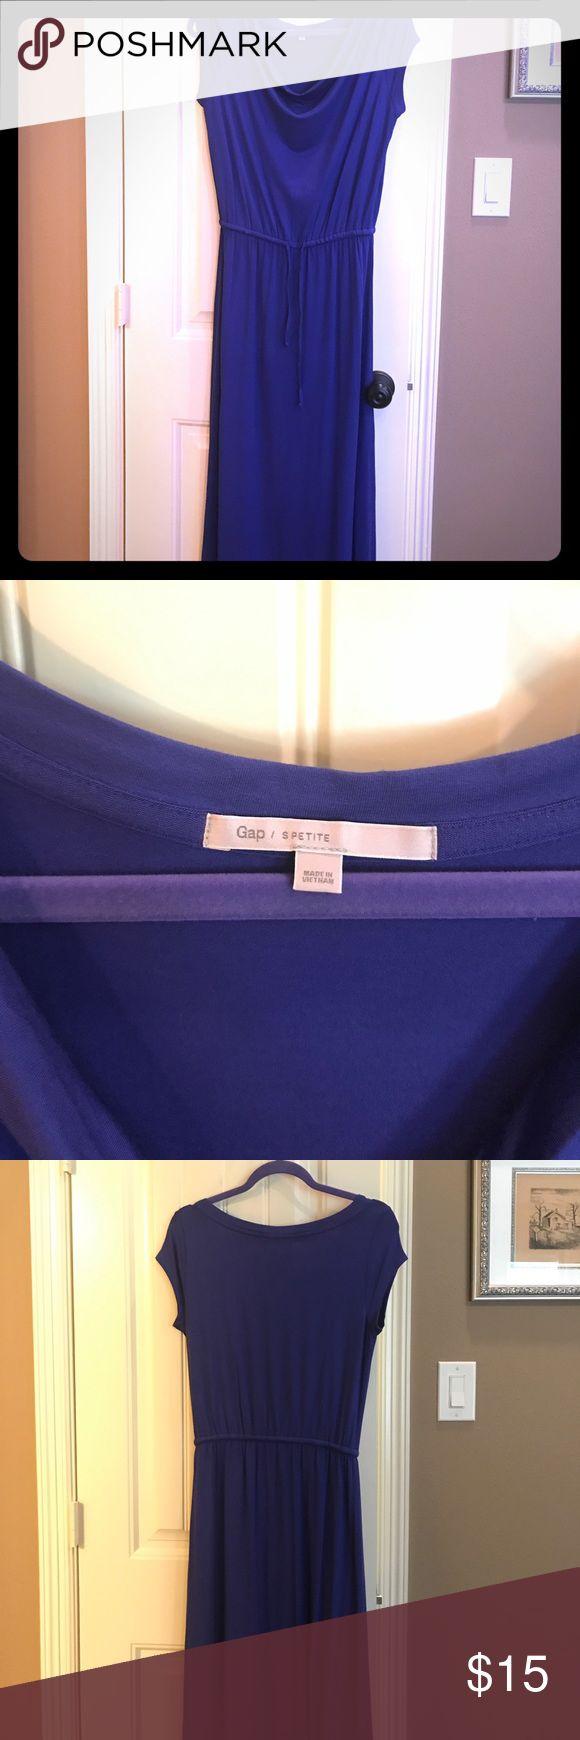 gap petite maxi dress Gap Bright blue knit maxi dress GAP Dresses Maxi